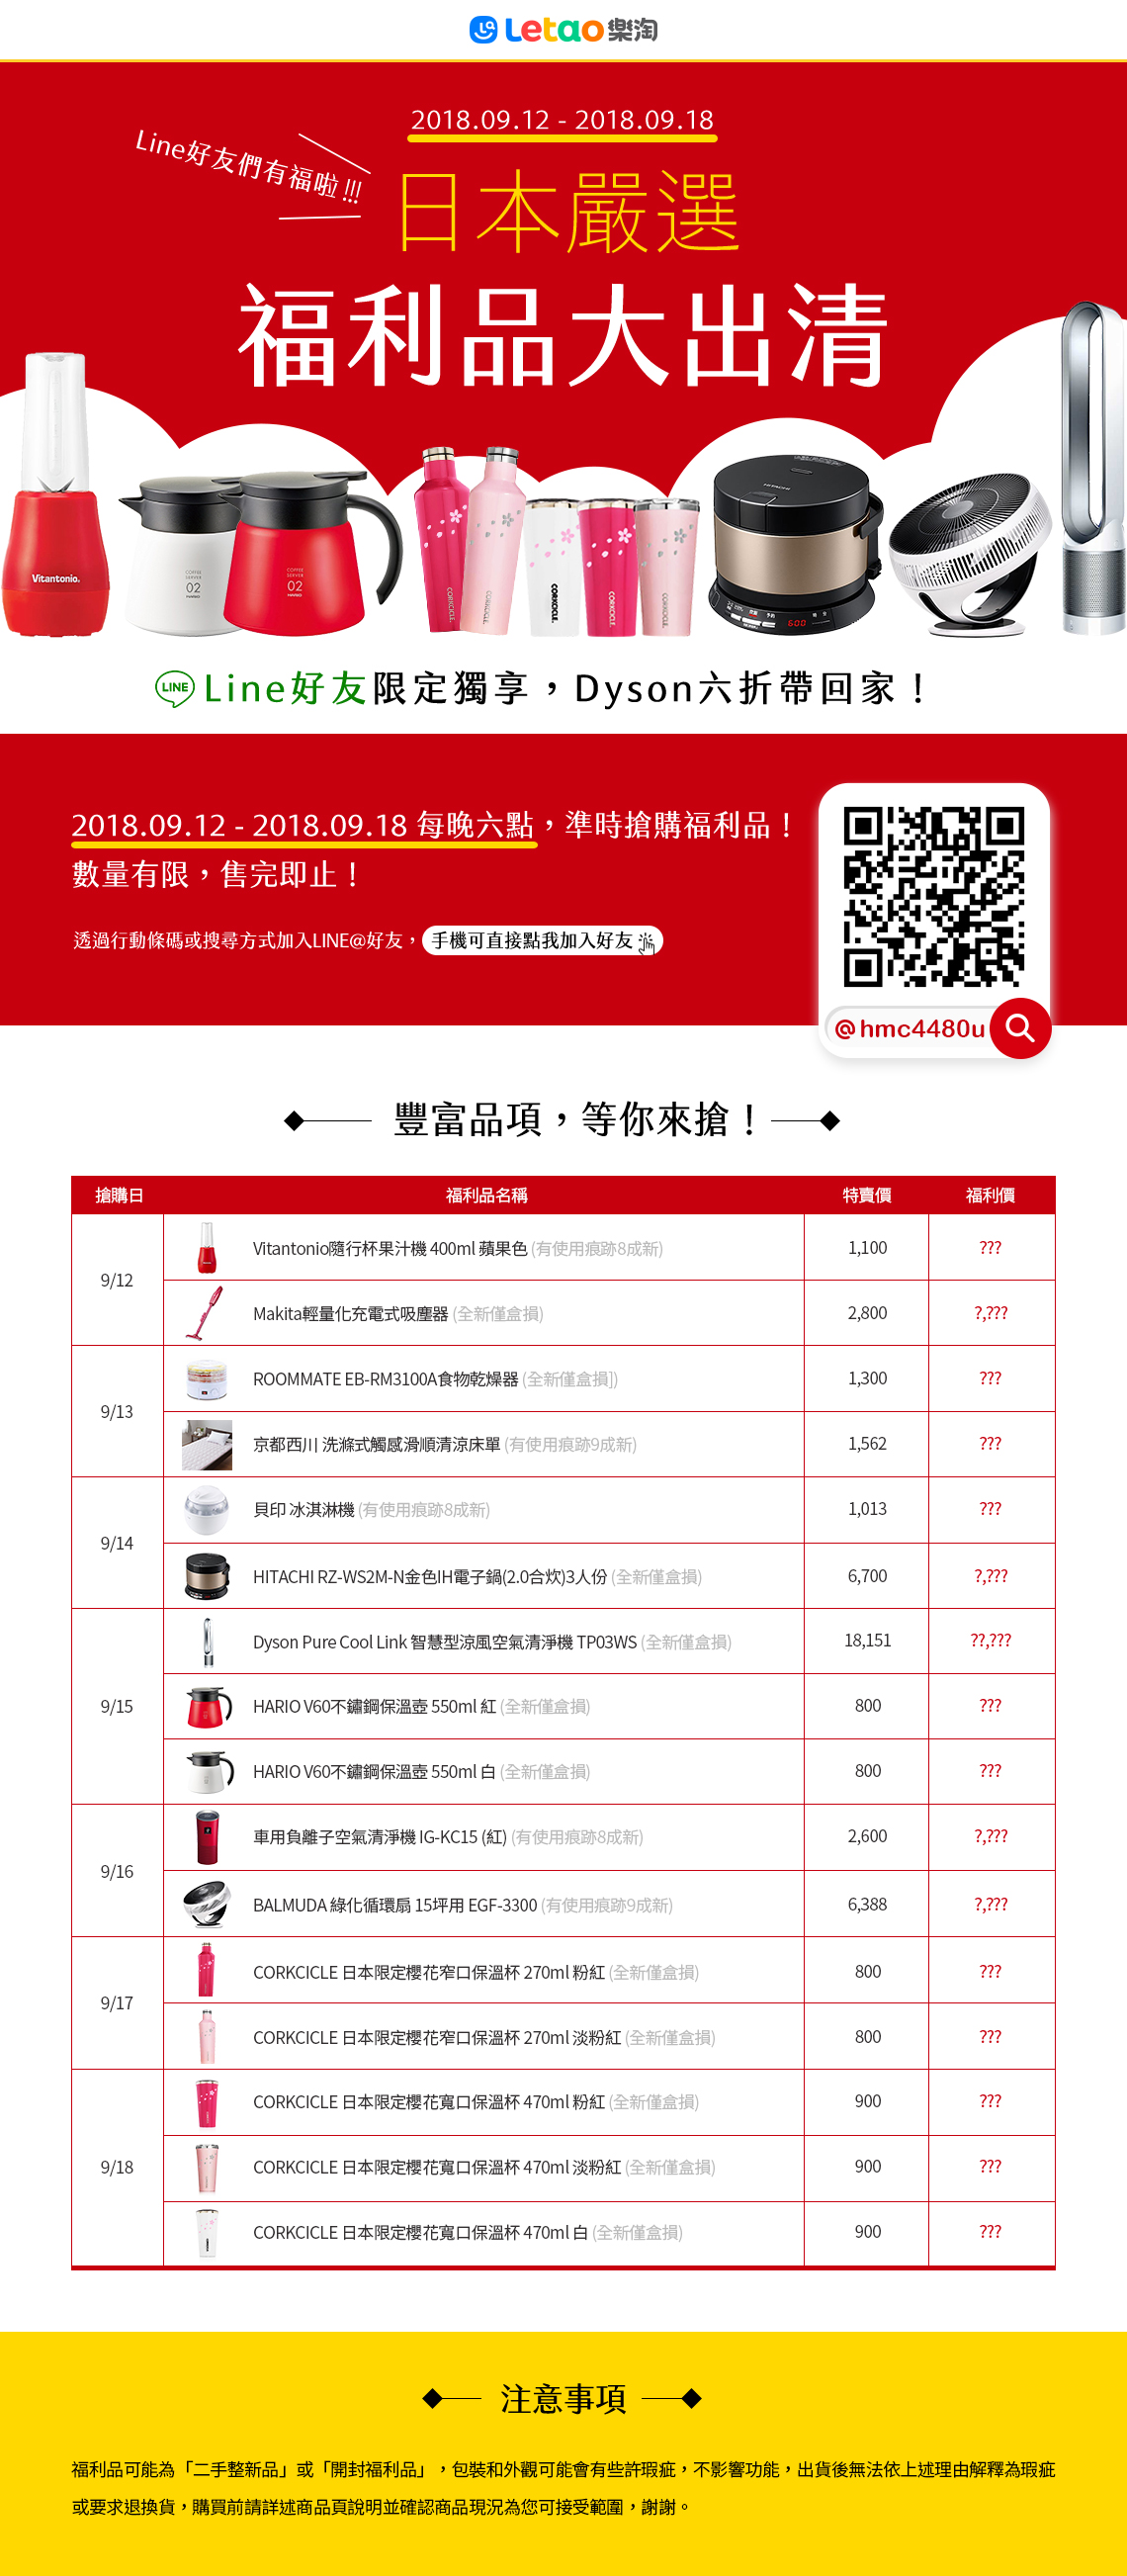 letao樂淘 - 2018/5/25-9/28歡慶樂淘突破10萬會員!加入LINE@好友,回饋好禮週週抽!